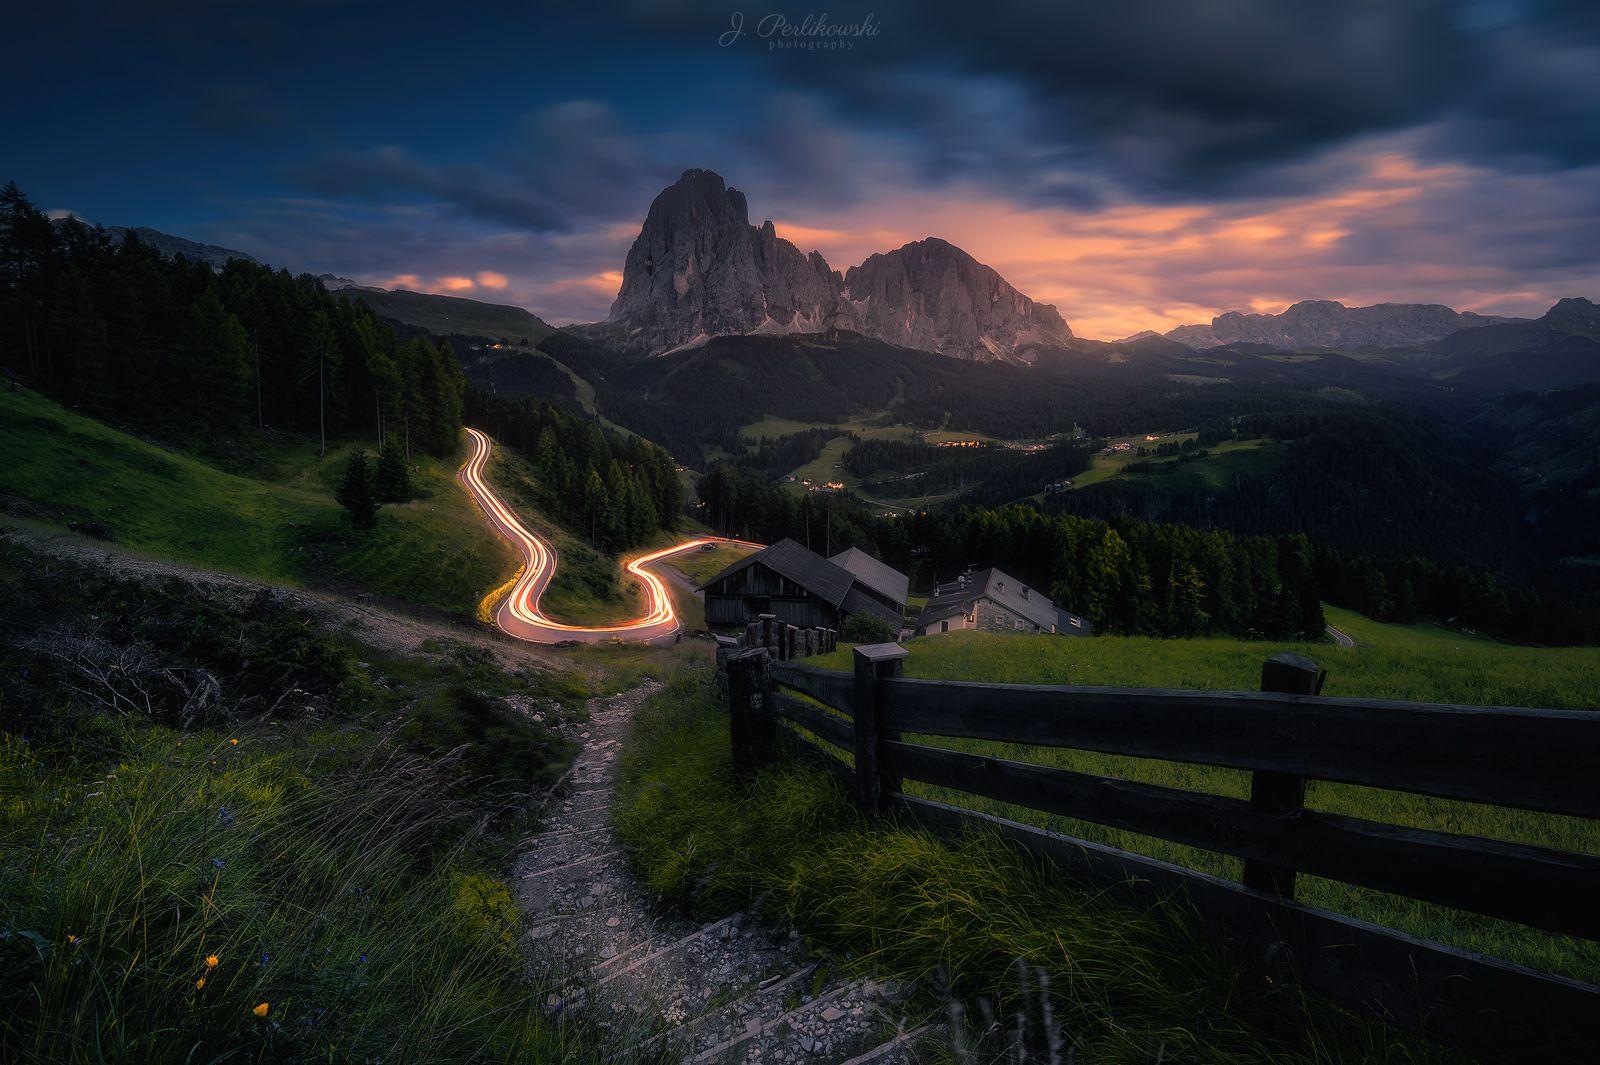 alps, long exp, long exposure, mountains, lights, lighttrails, Perlikowski Jakub